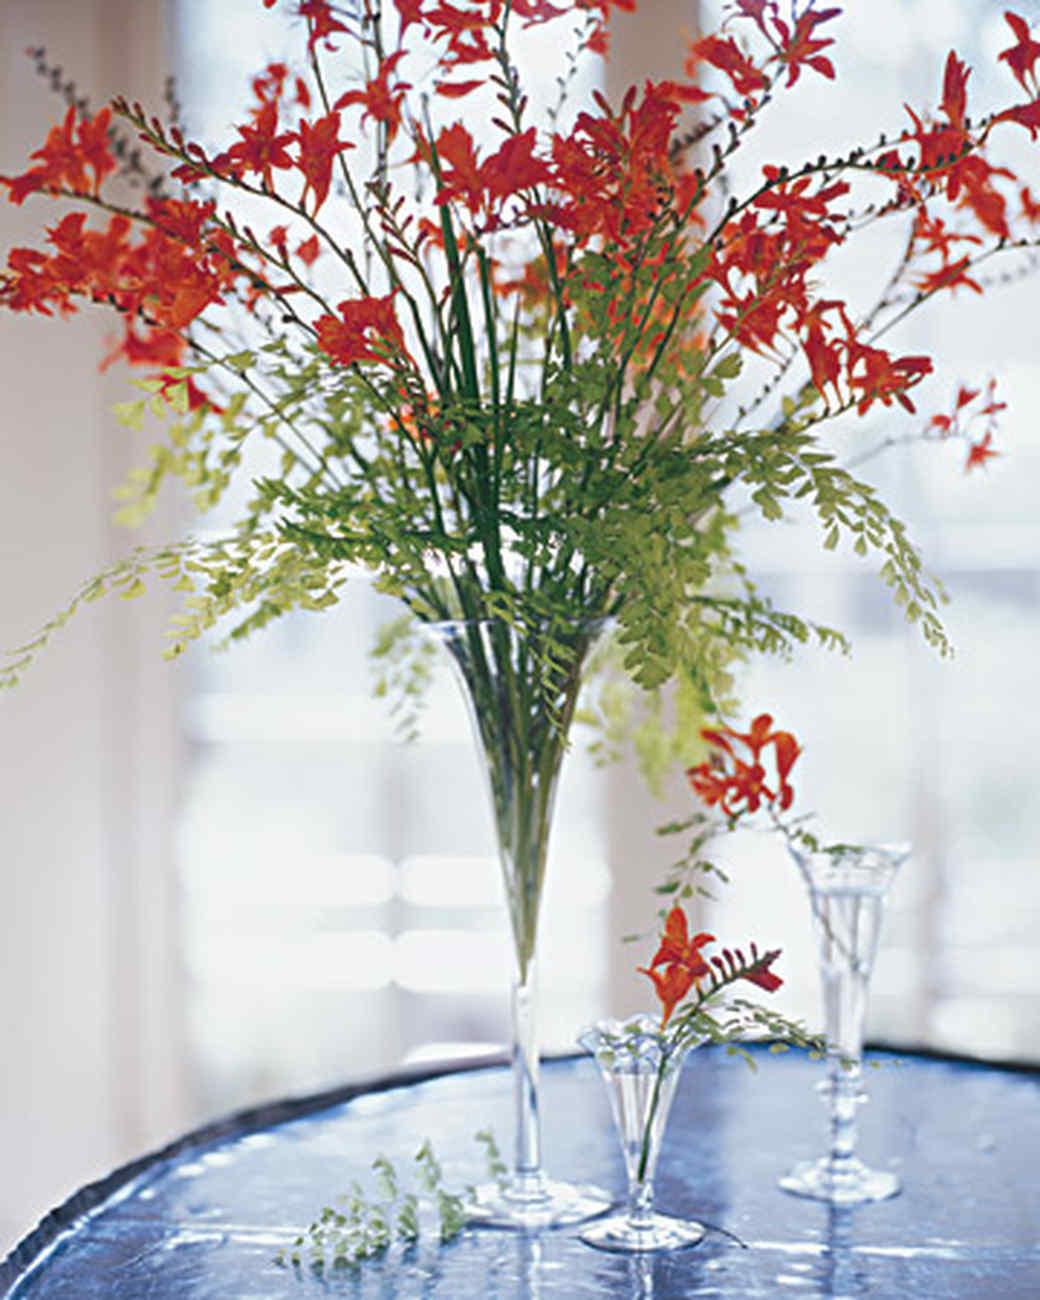 Marthas flower arranging secrets martha stewart lesson 3 izmirmasajfo